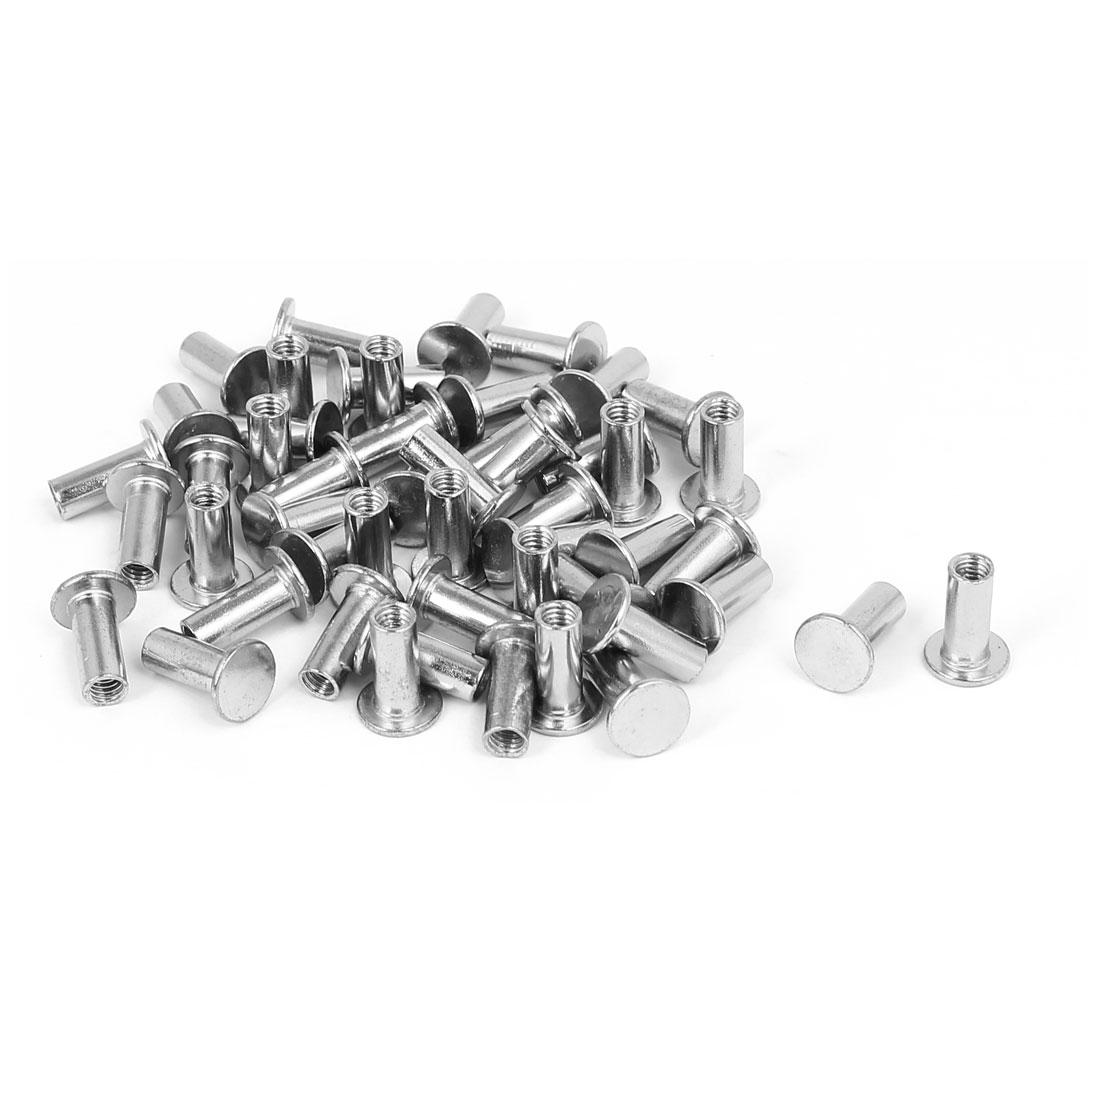 Photo Album Metal Nickel Plated Binding Screw Post Barrel Nut 5mmx12mm 50pcs